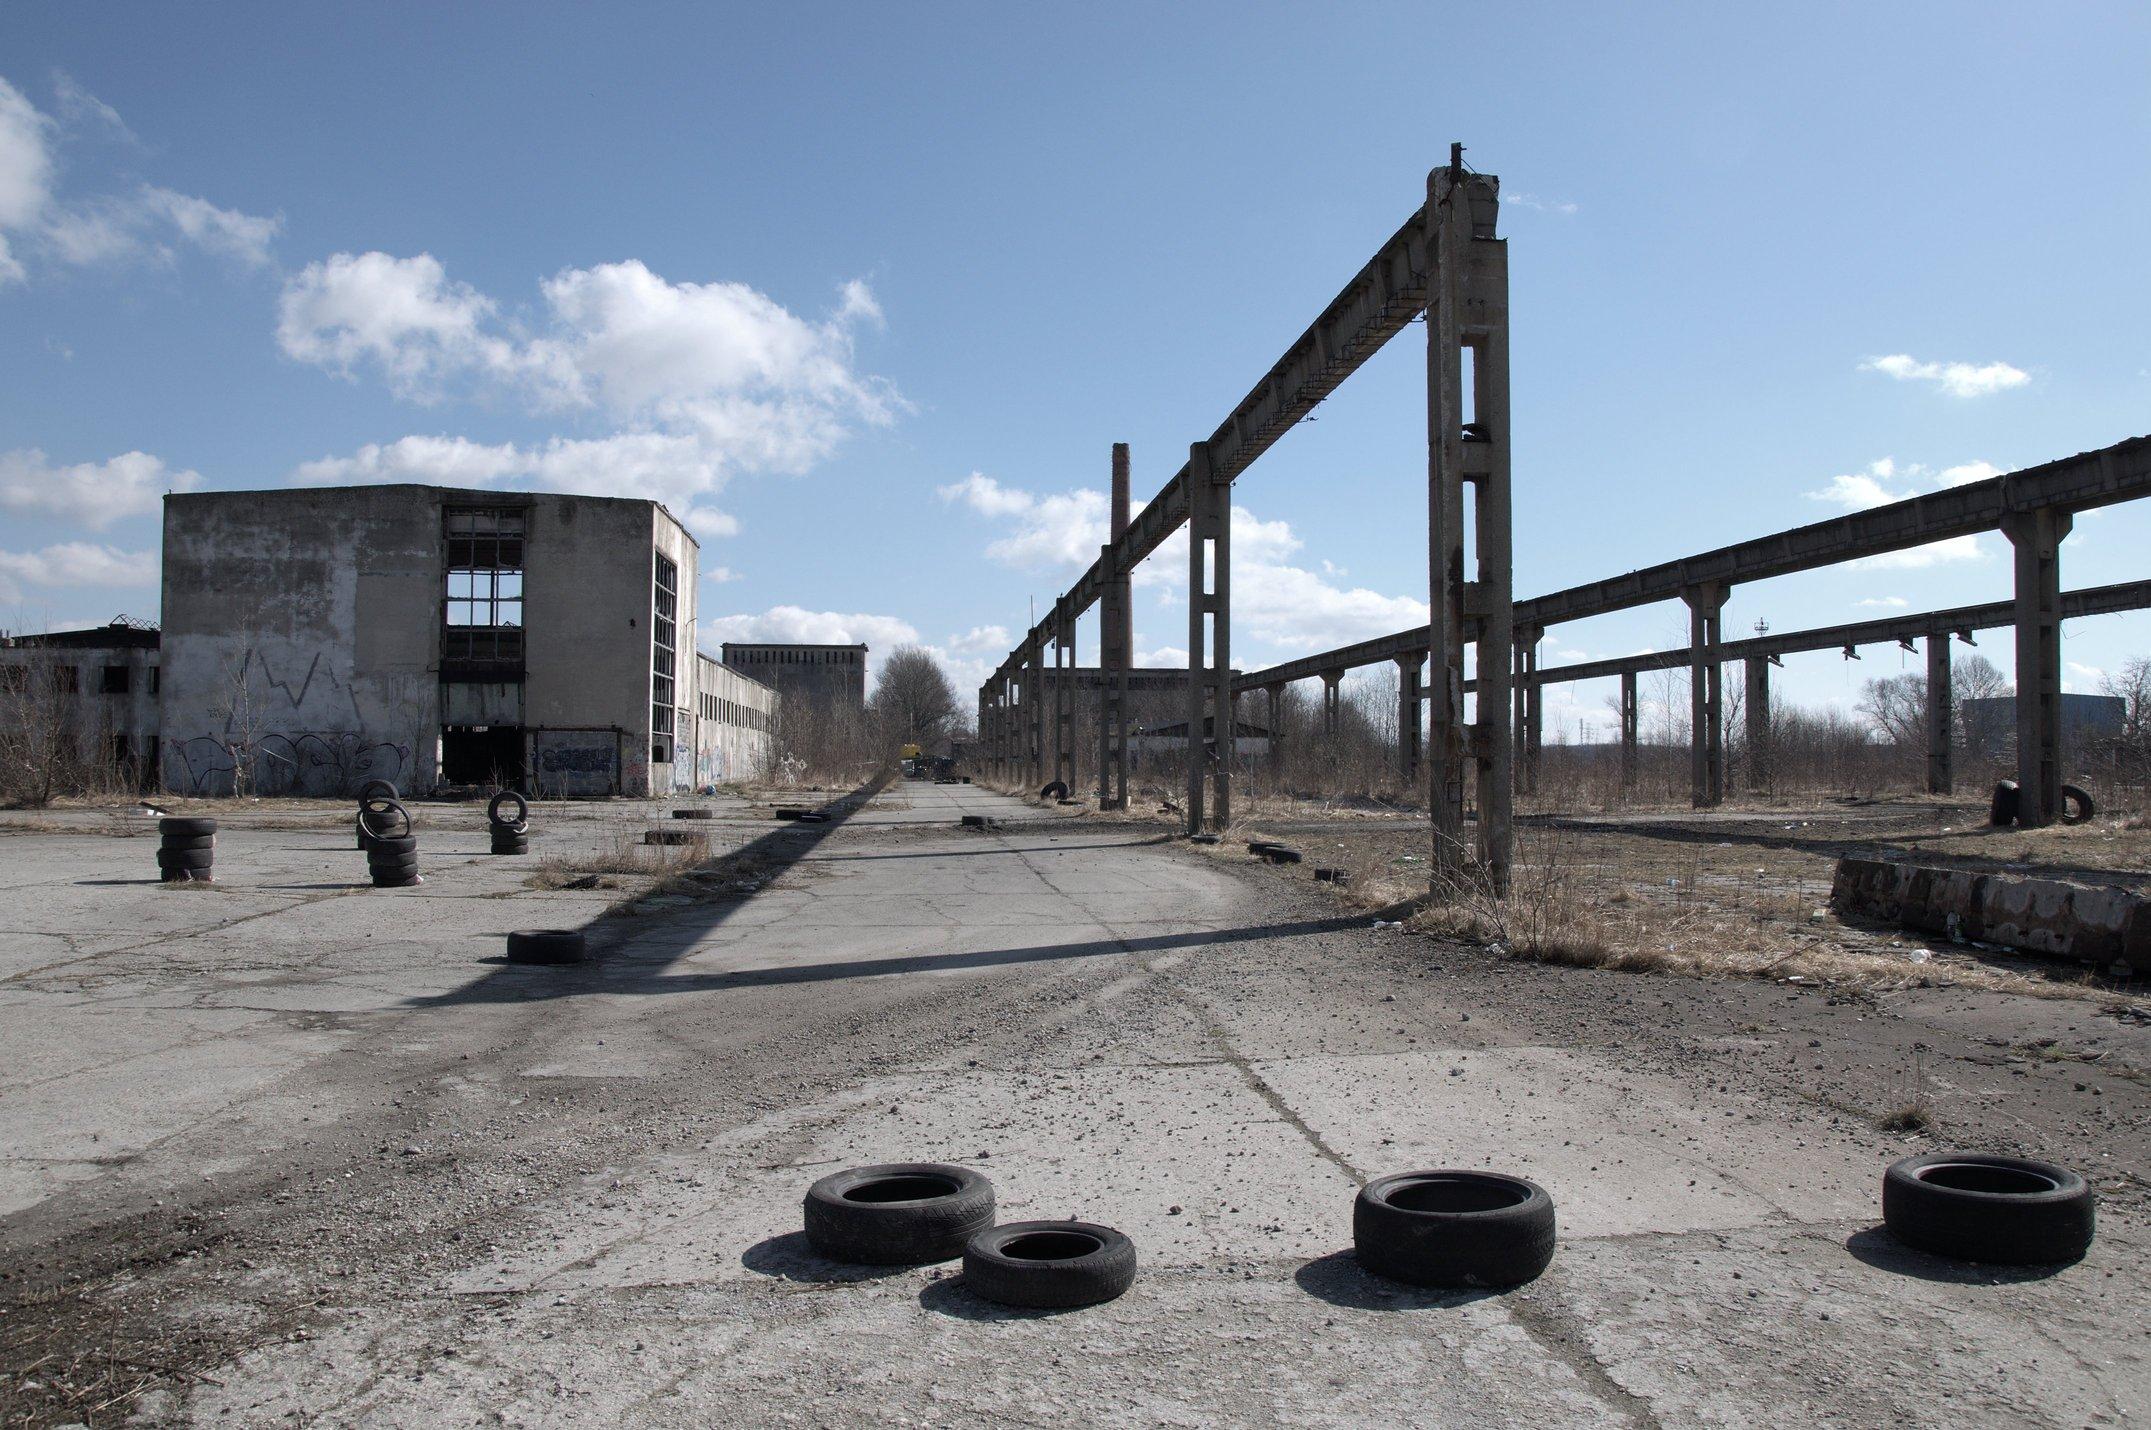 File:Abandoned factory - panoramio (15).jpg - Wikimedia Commons